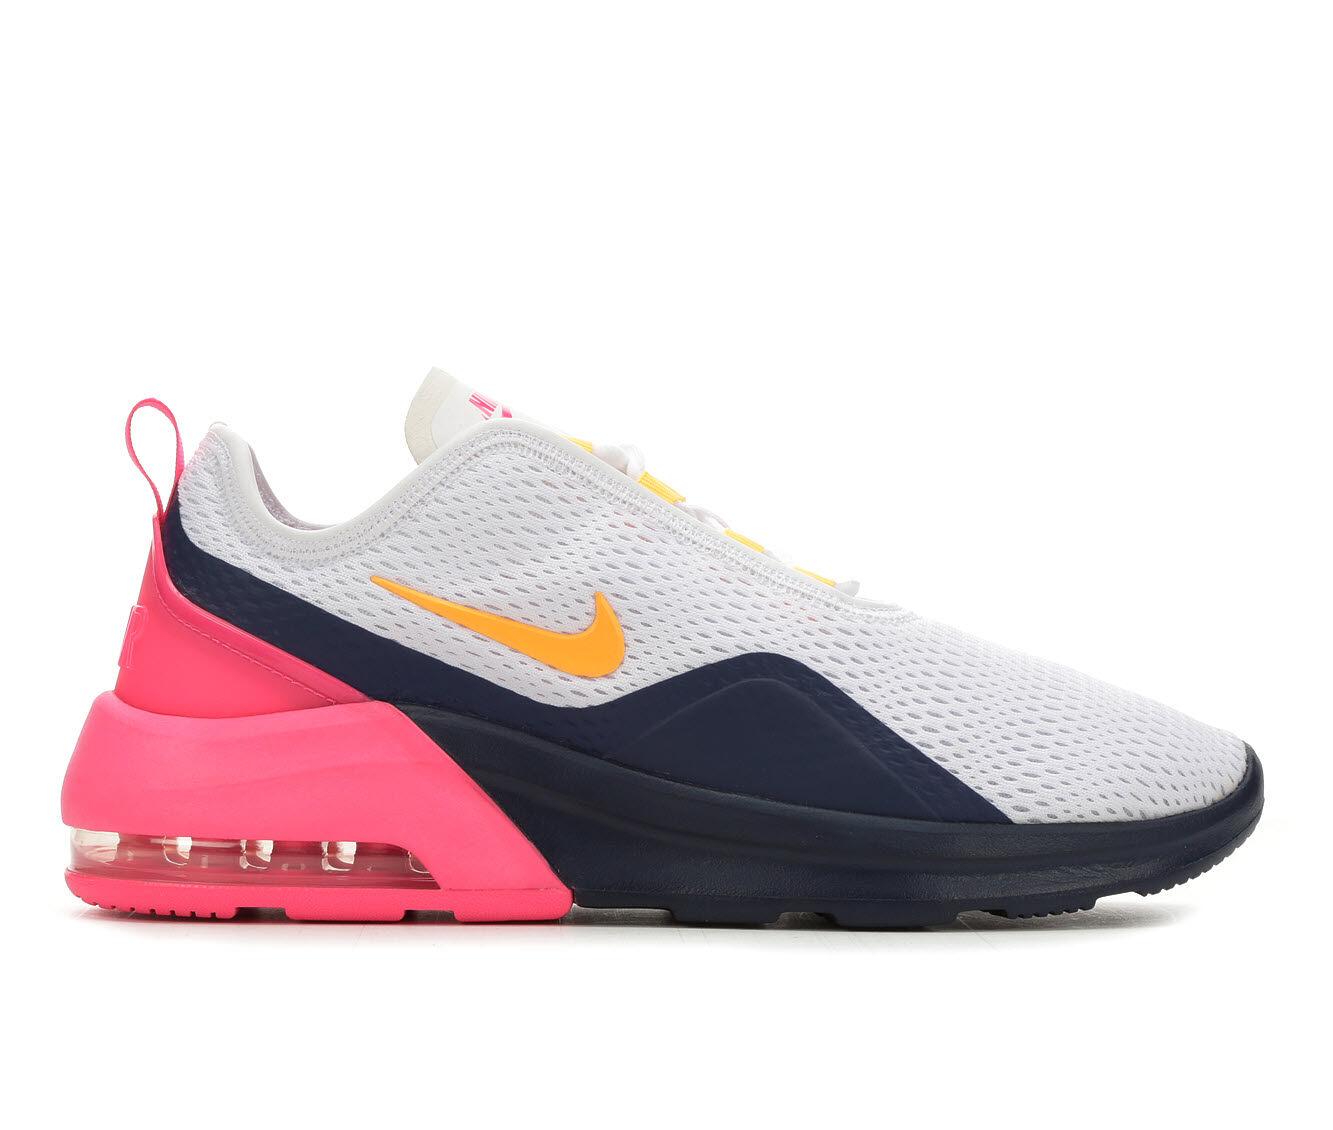 Women's Nike Air Max Motion 2 Sneakers Wht/Orange/Navy